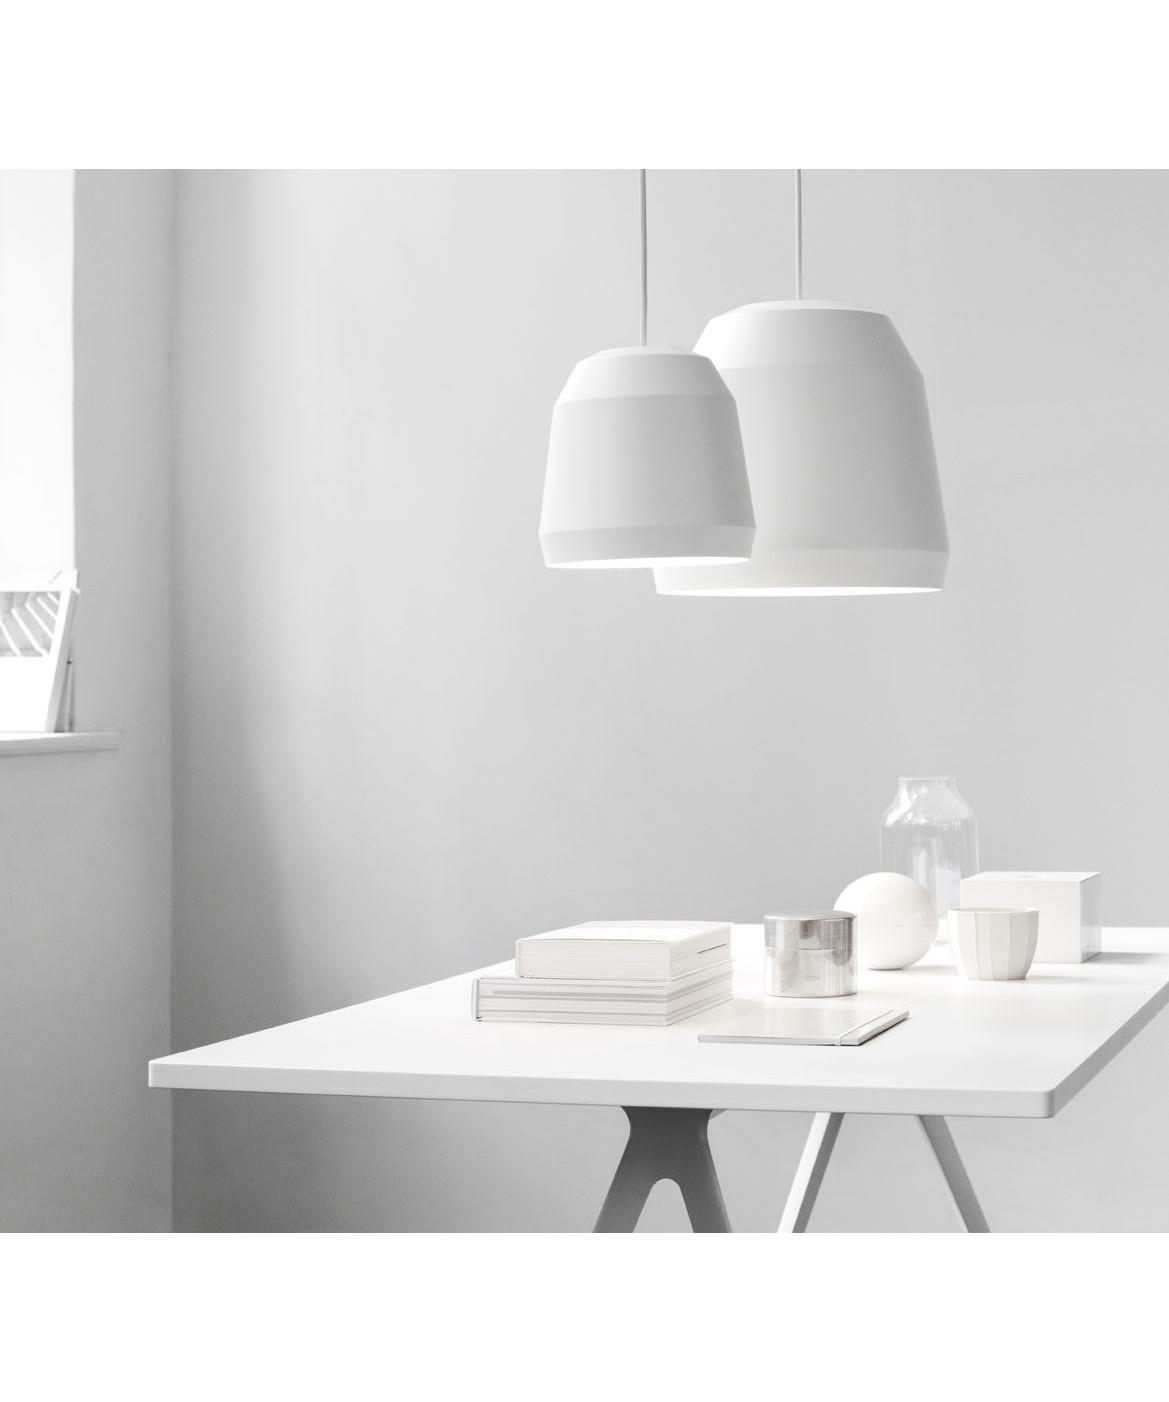 Image of Mingus P2 Pendel White 3m - Lightyears (4460261)